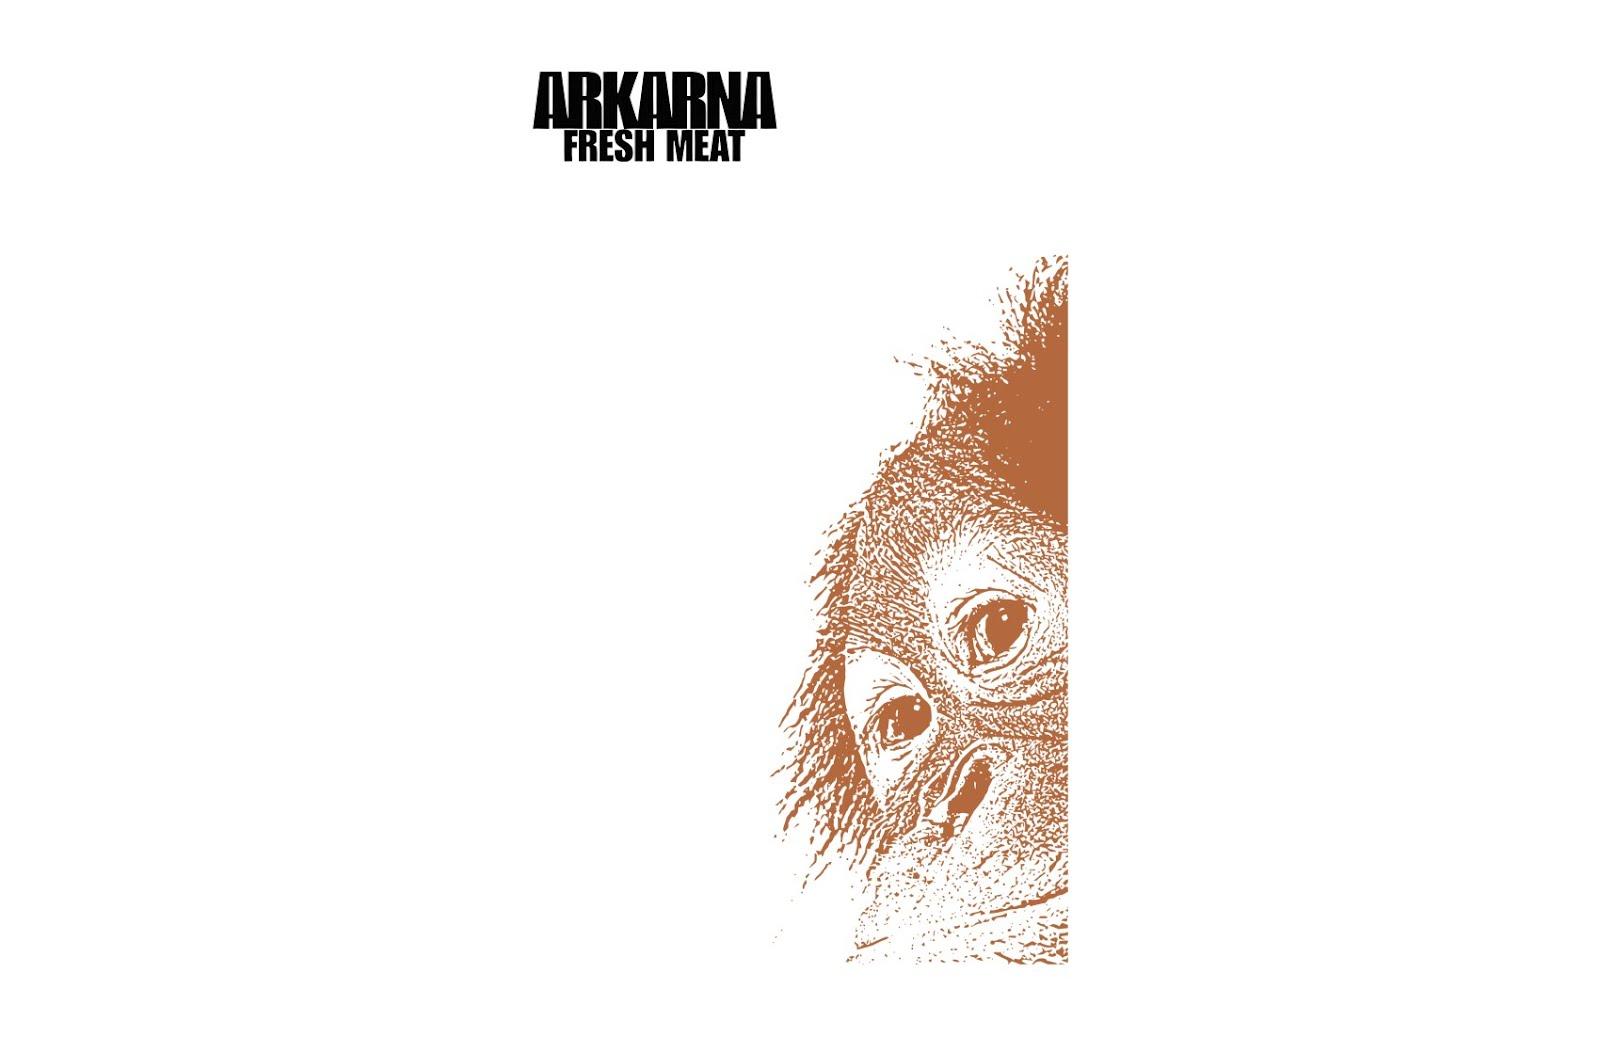 arkarna-fresh_meat_front_vector